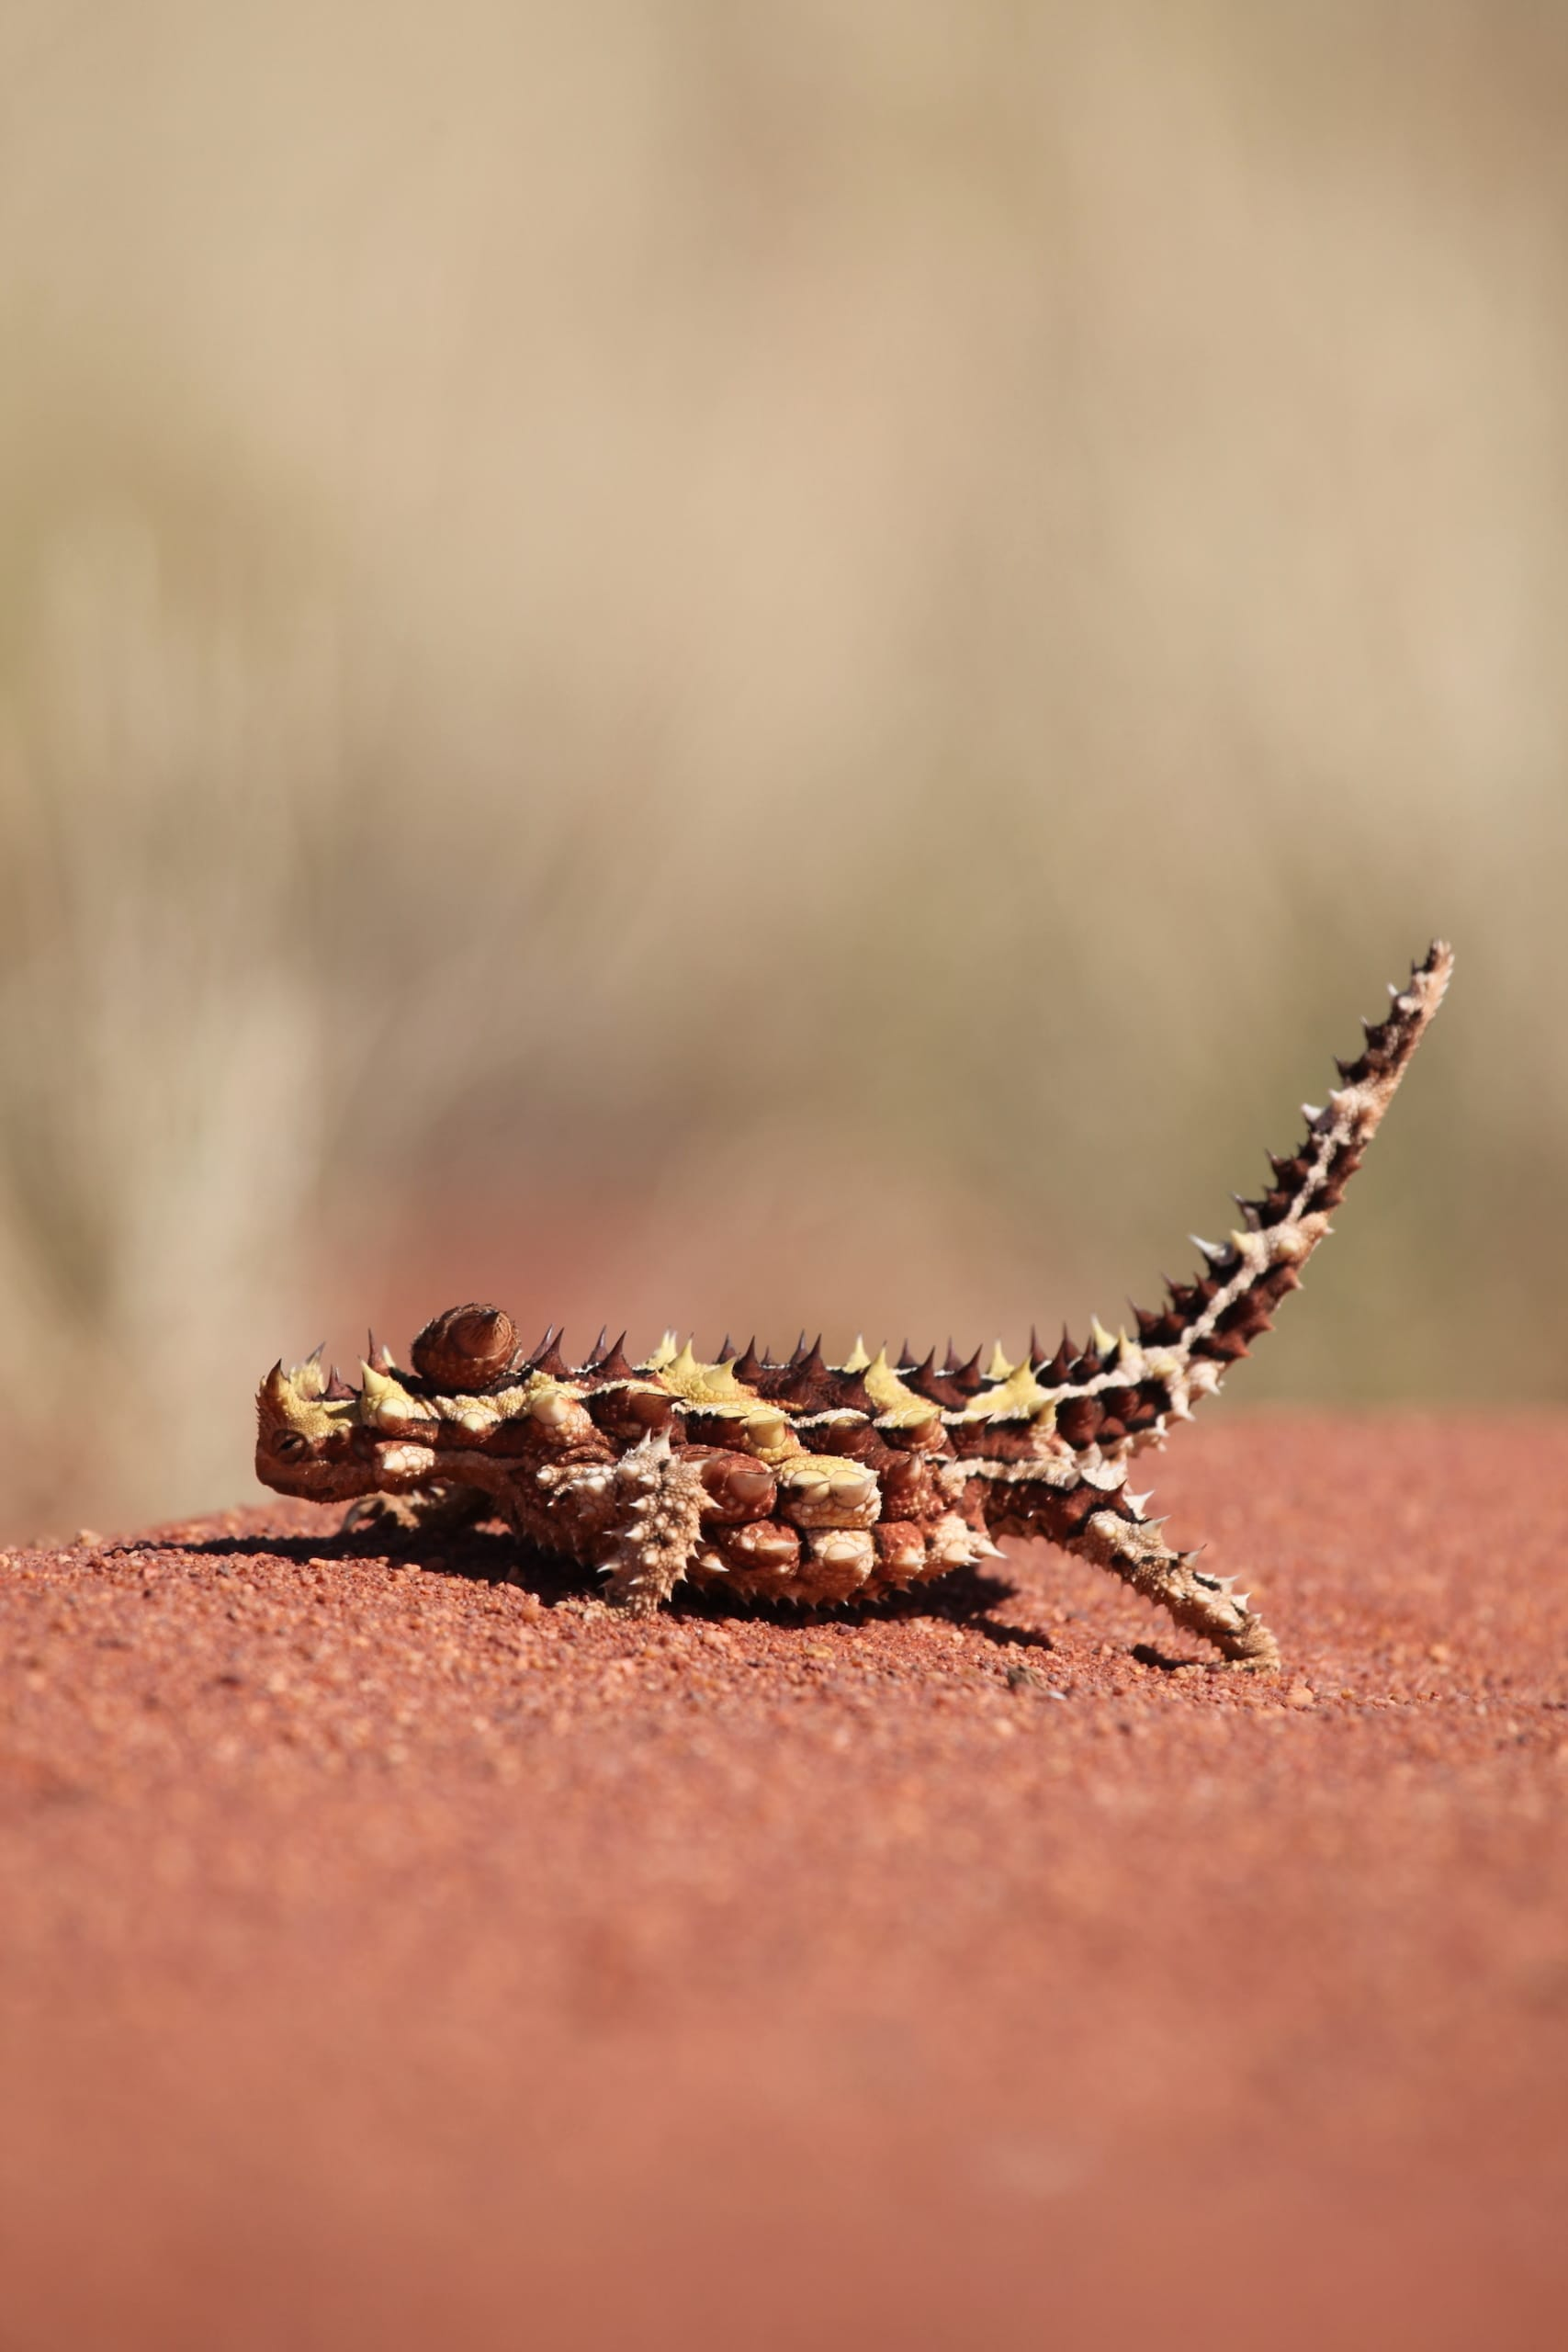 Thorny Devil in australischem Outback